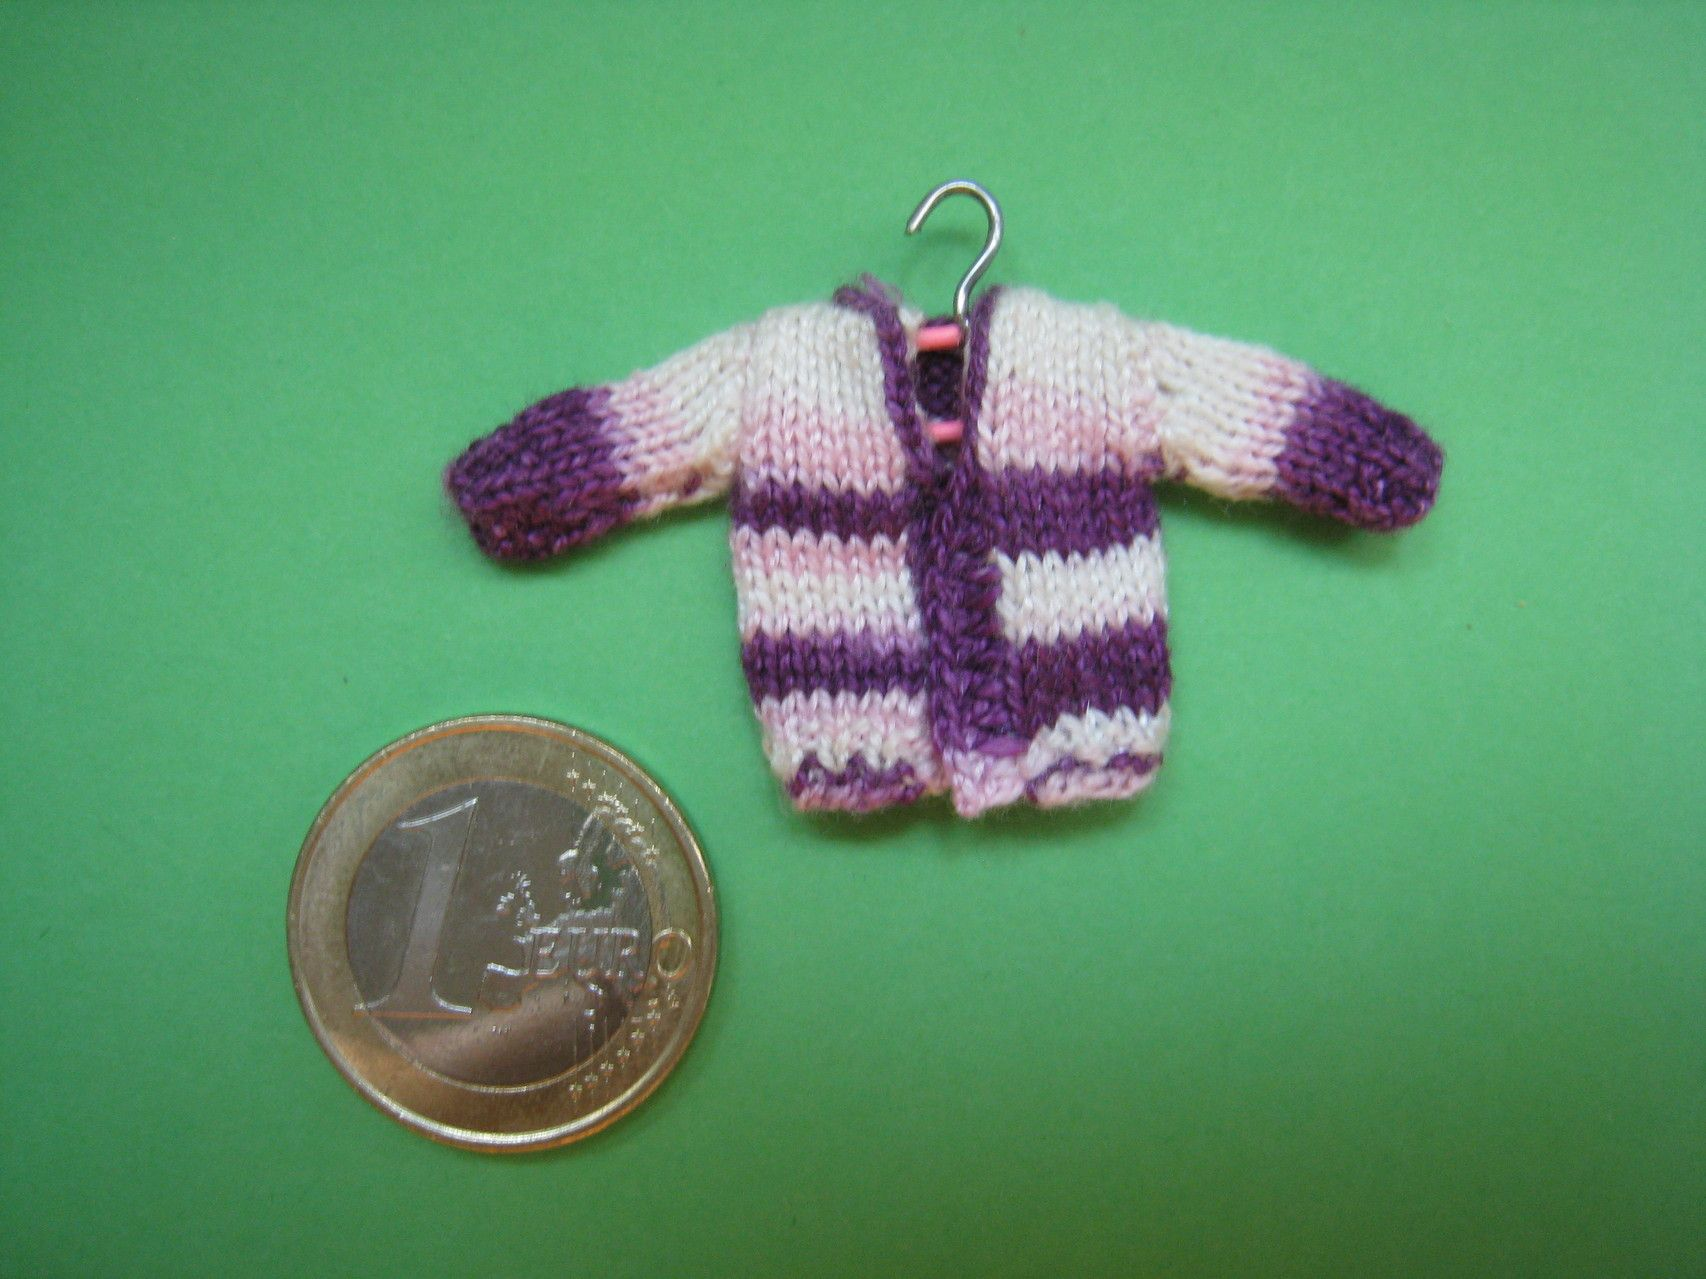 Mini Jerseys / Mini Pullover - Aitira Miniaturas. Miniaturas artesanales para tu casa de muñecas. Minipunto/miniknitting